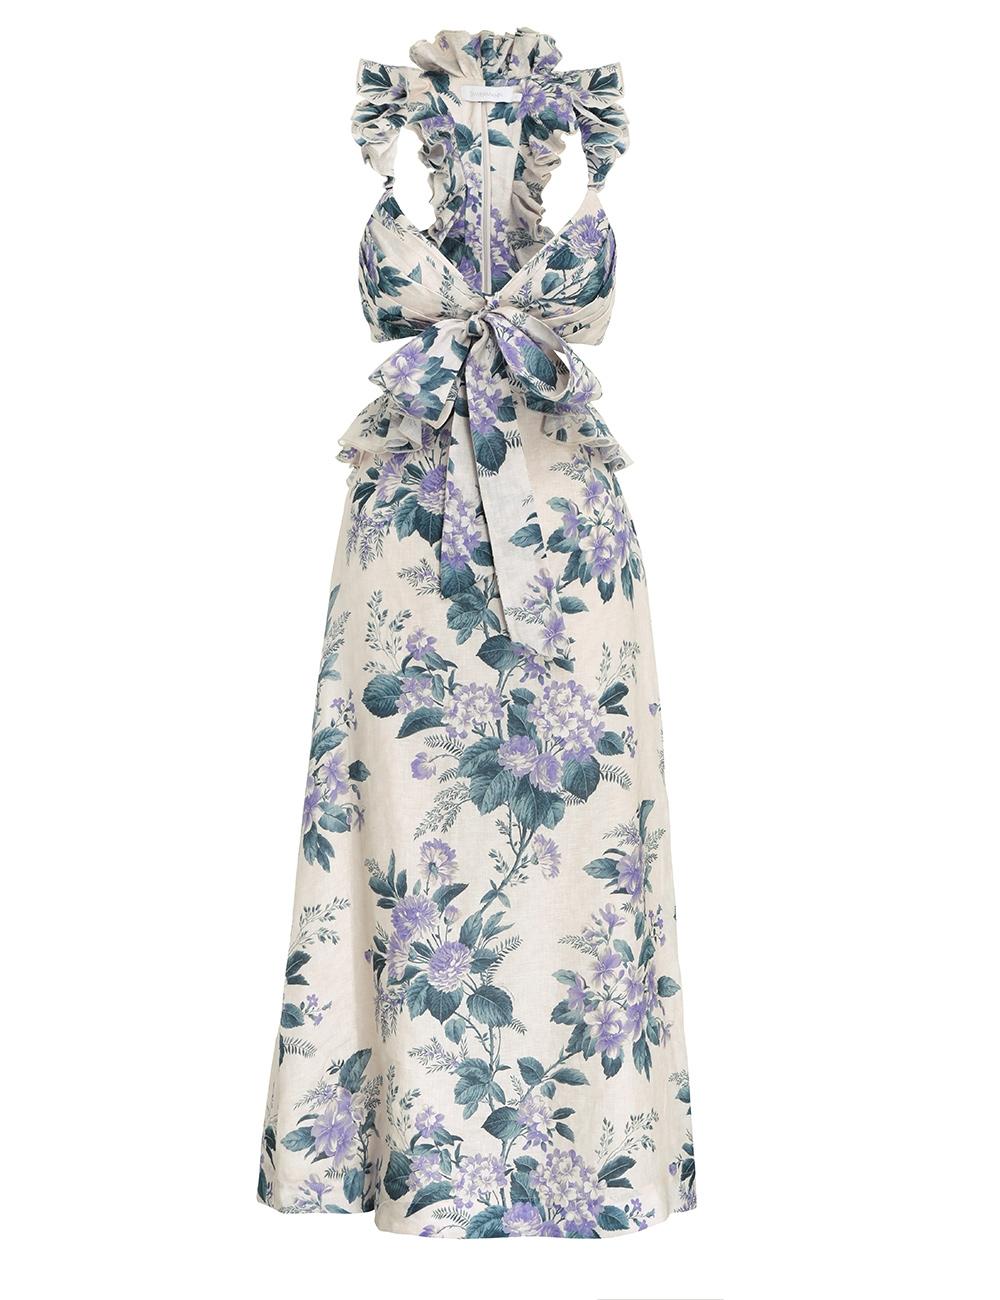 Cassia Ruffle Midi Dress